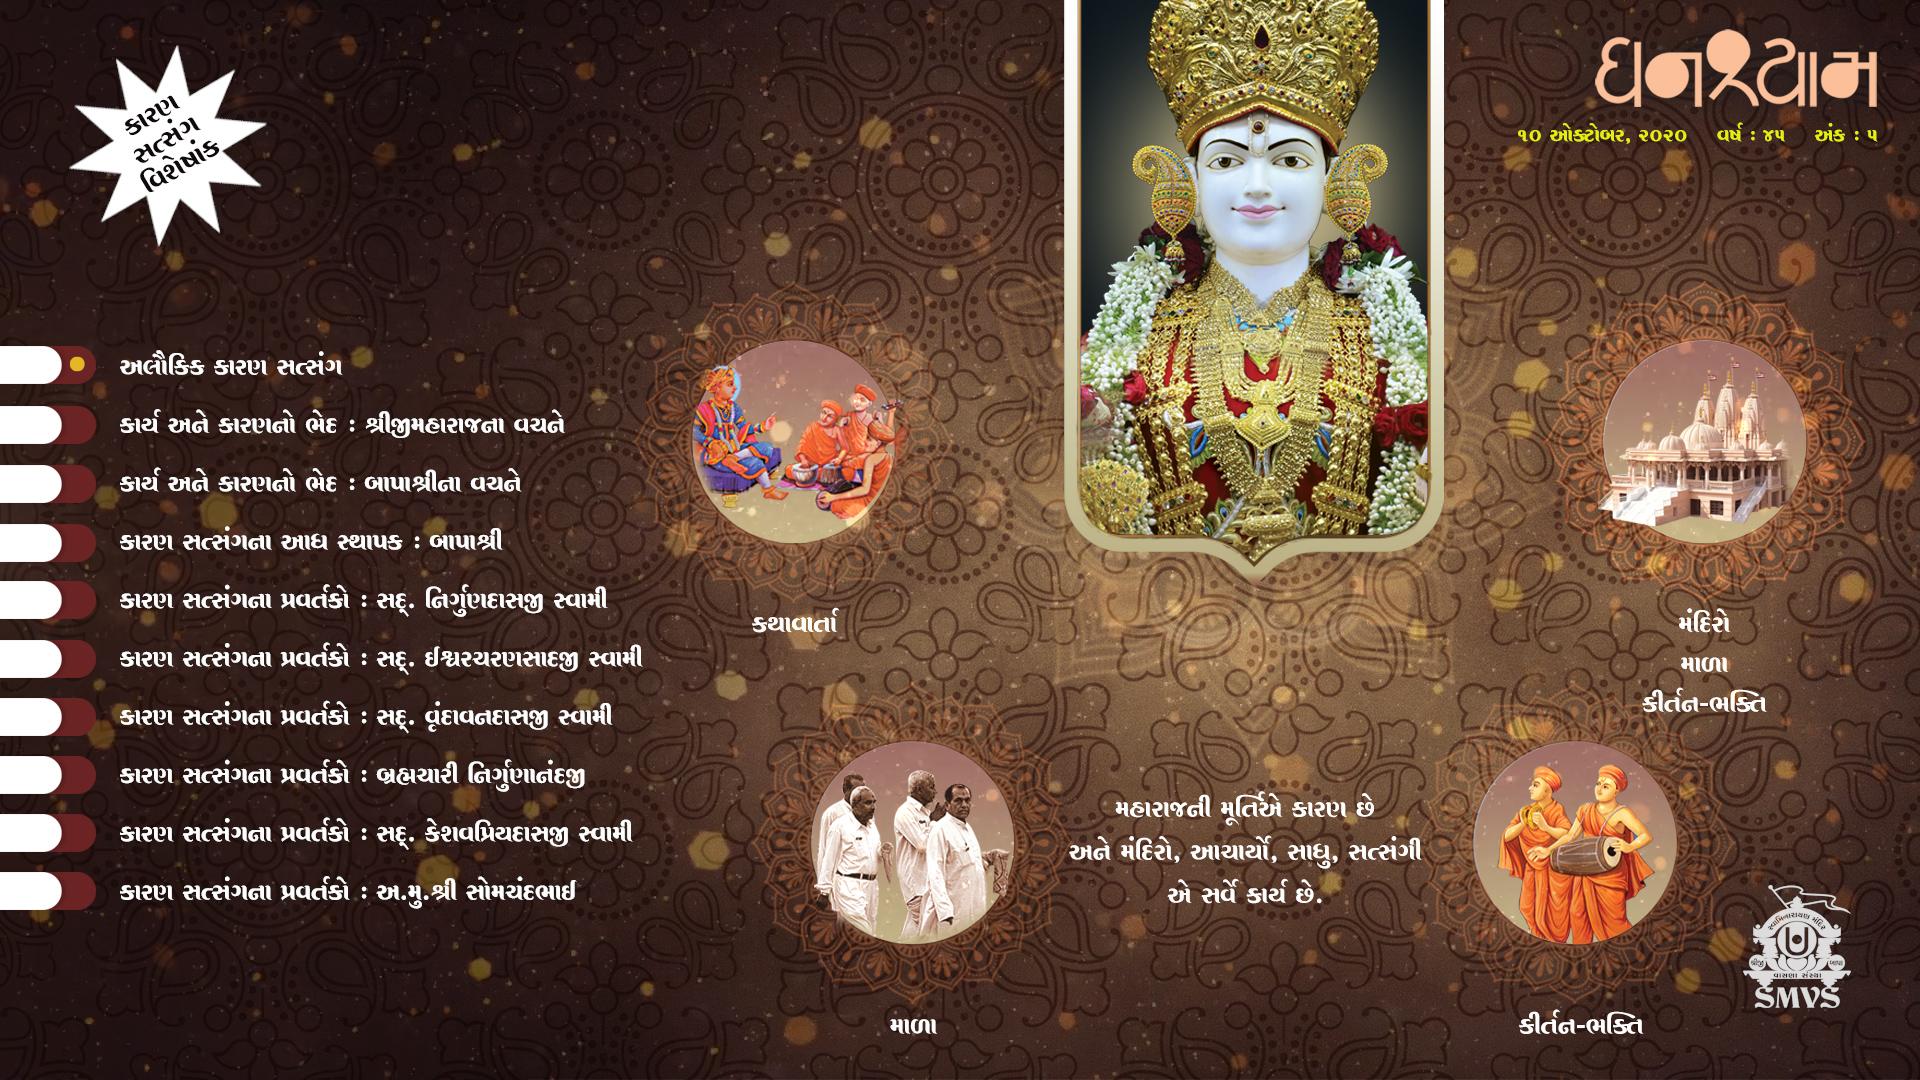 October 2020 | Ghanshyam Magazine Audio Jukebox